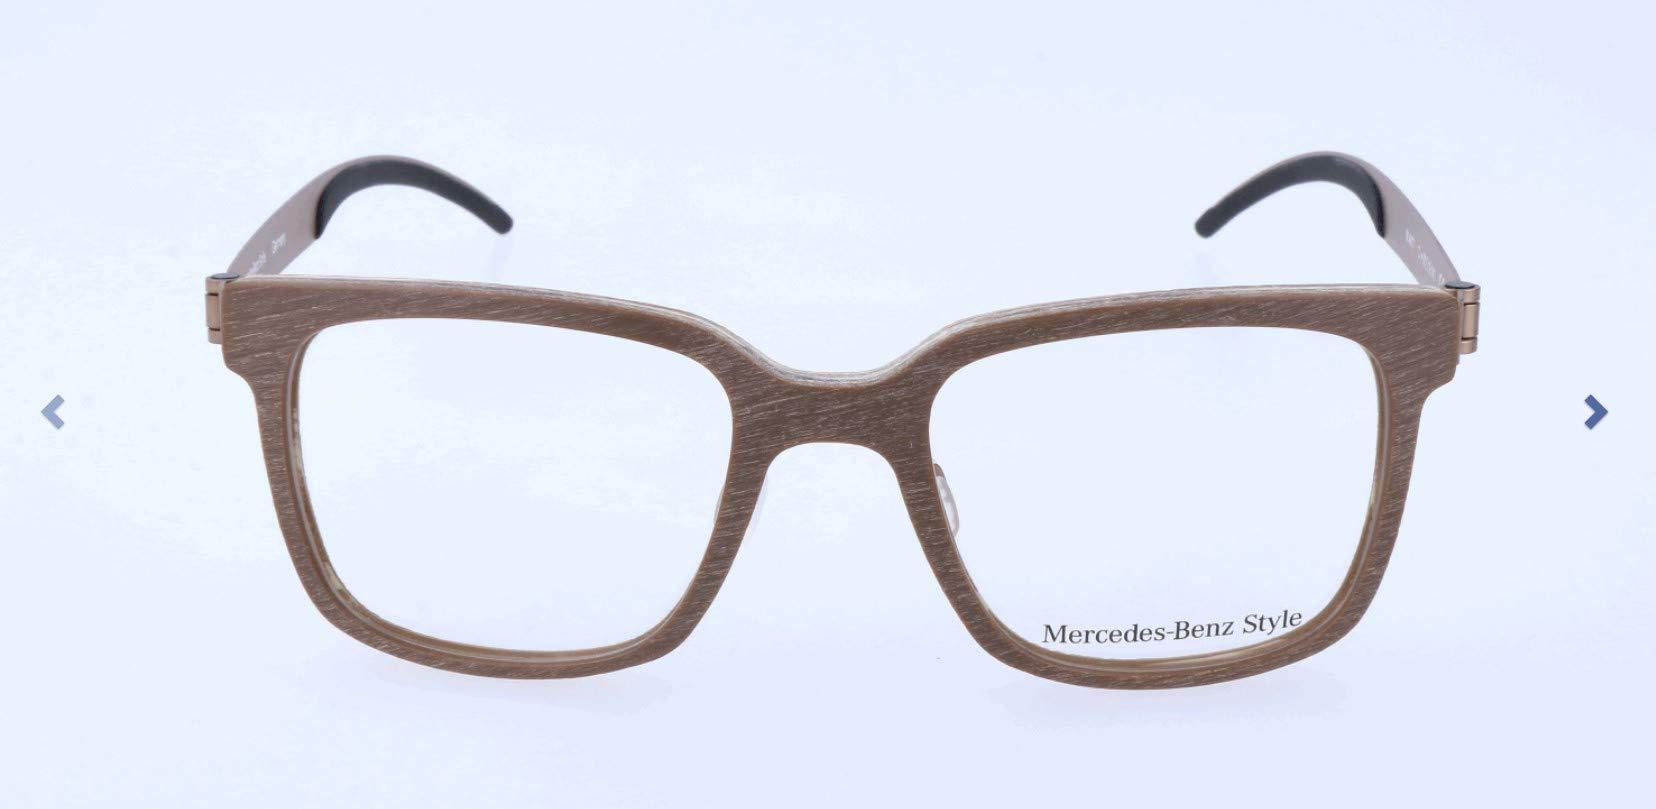 SoleilMarronbraun50 M4017 Générique Mercedes 0 De Benz Brillengestelle Lunettes Homme eorCxdBW